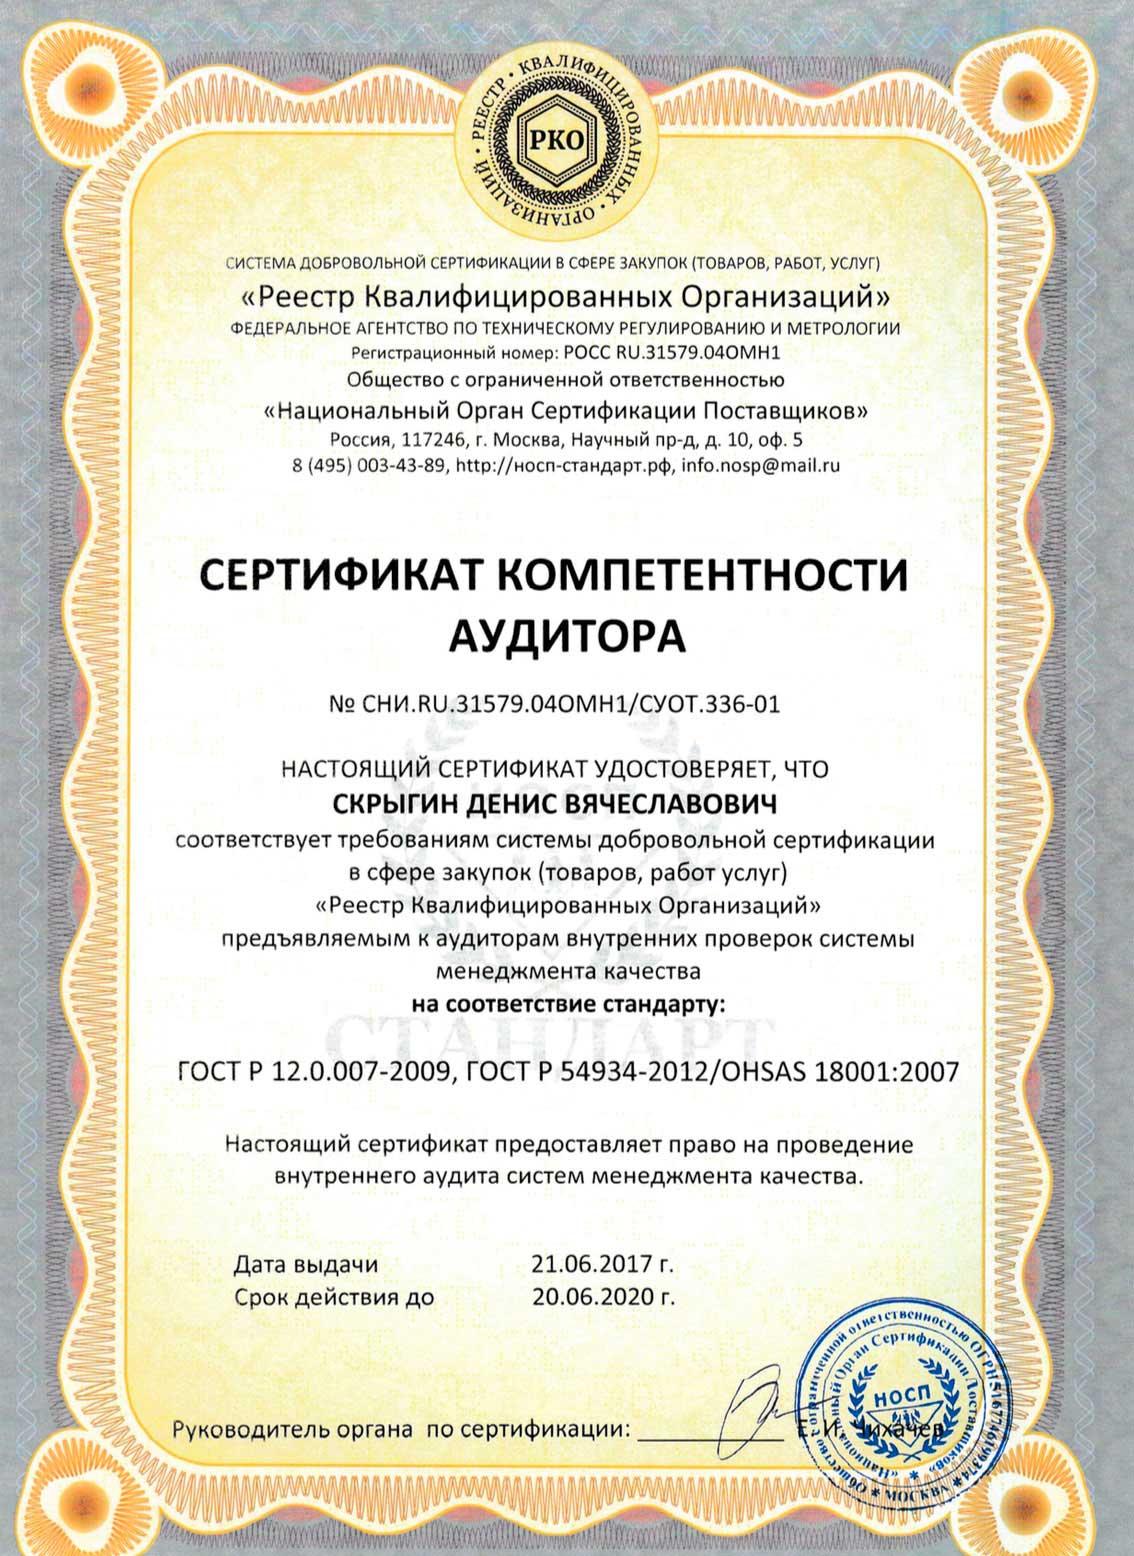 Сертификат компетентности